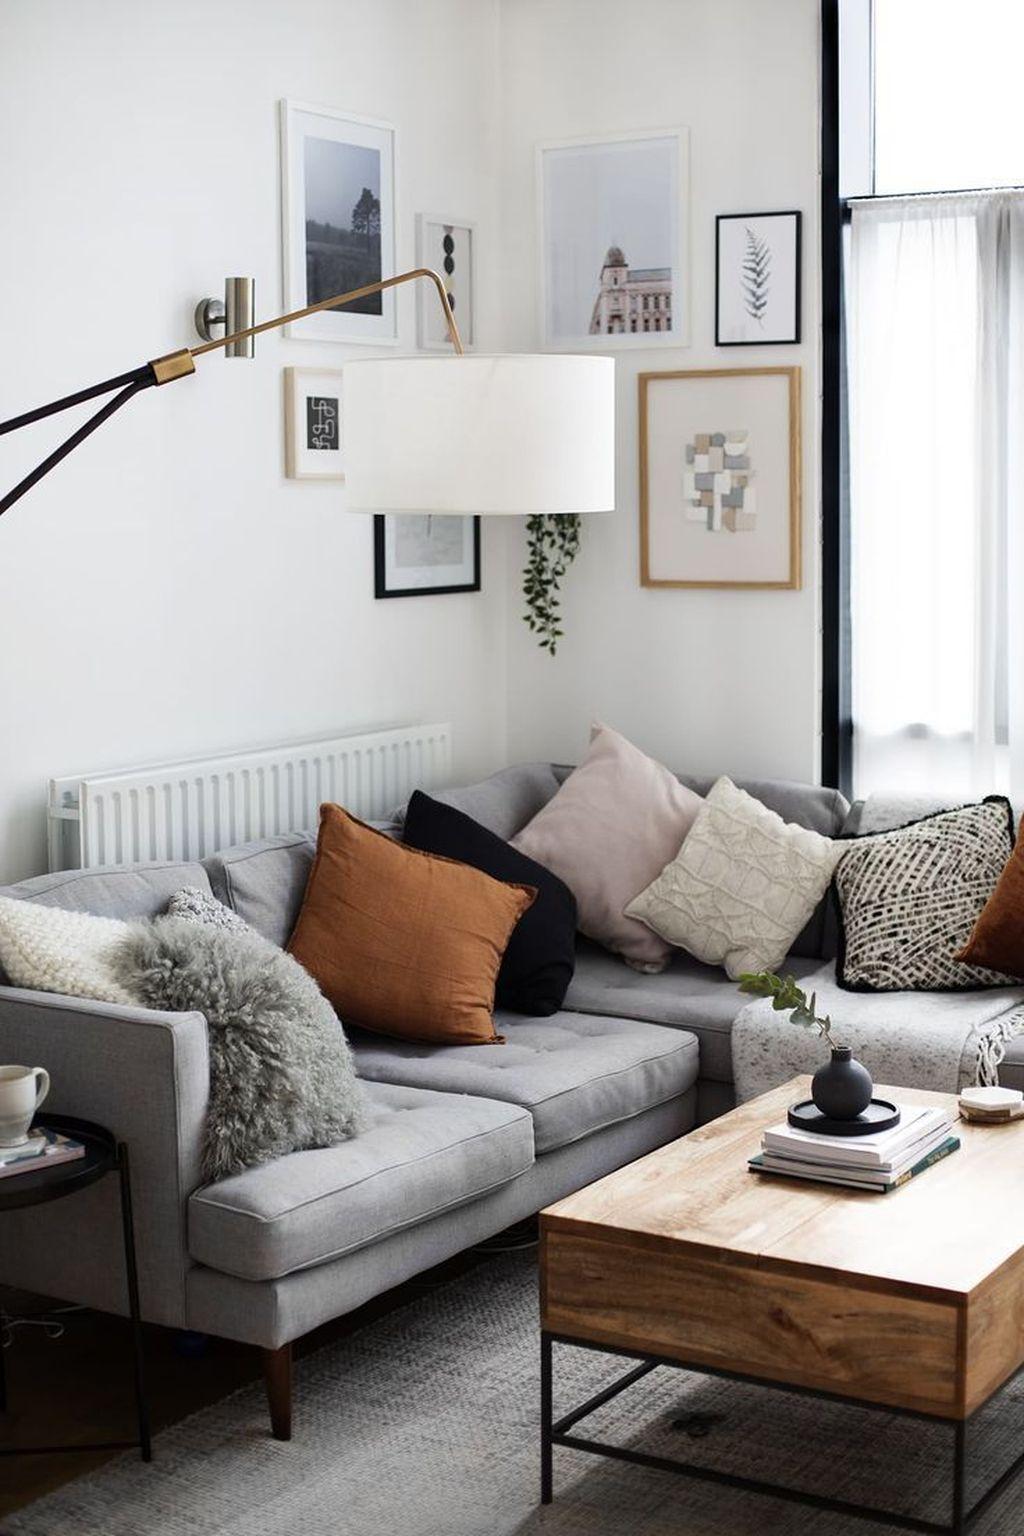 Inspiring Small Living Room Decor Ideas 28